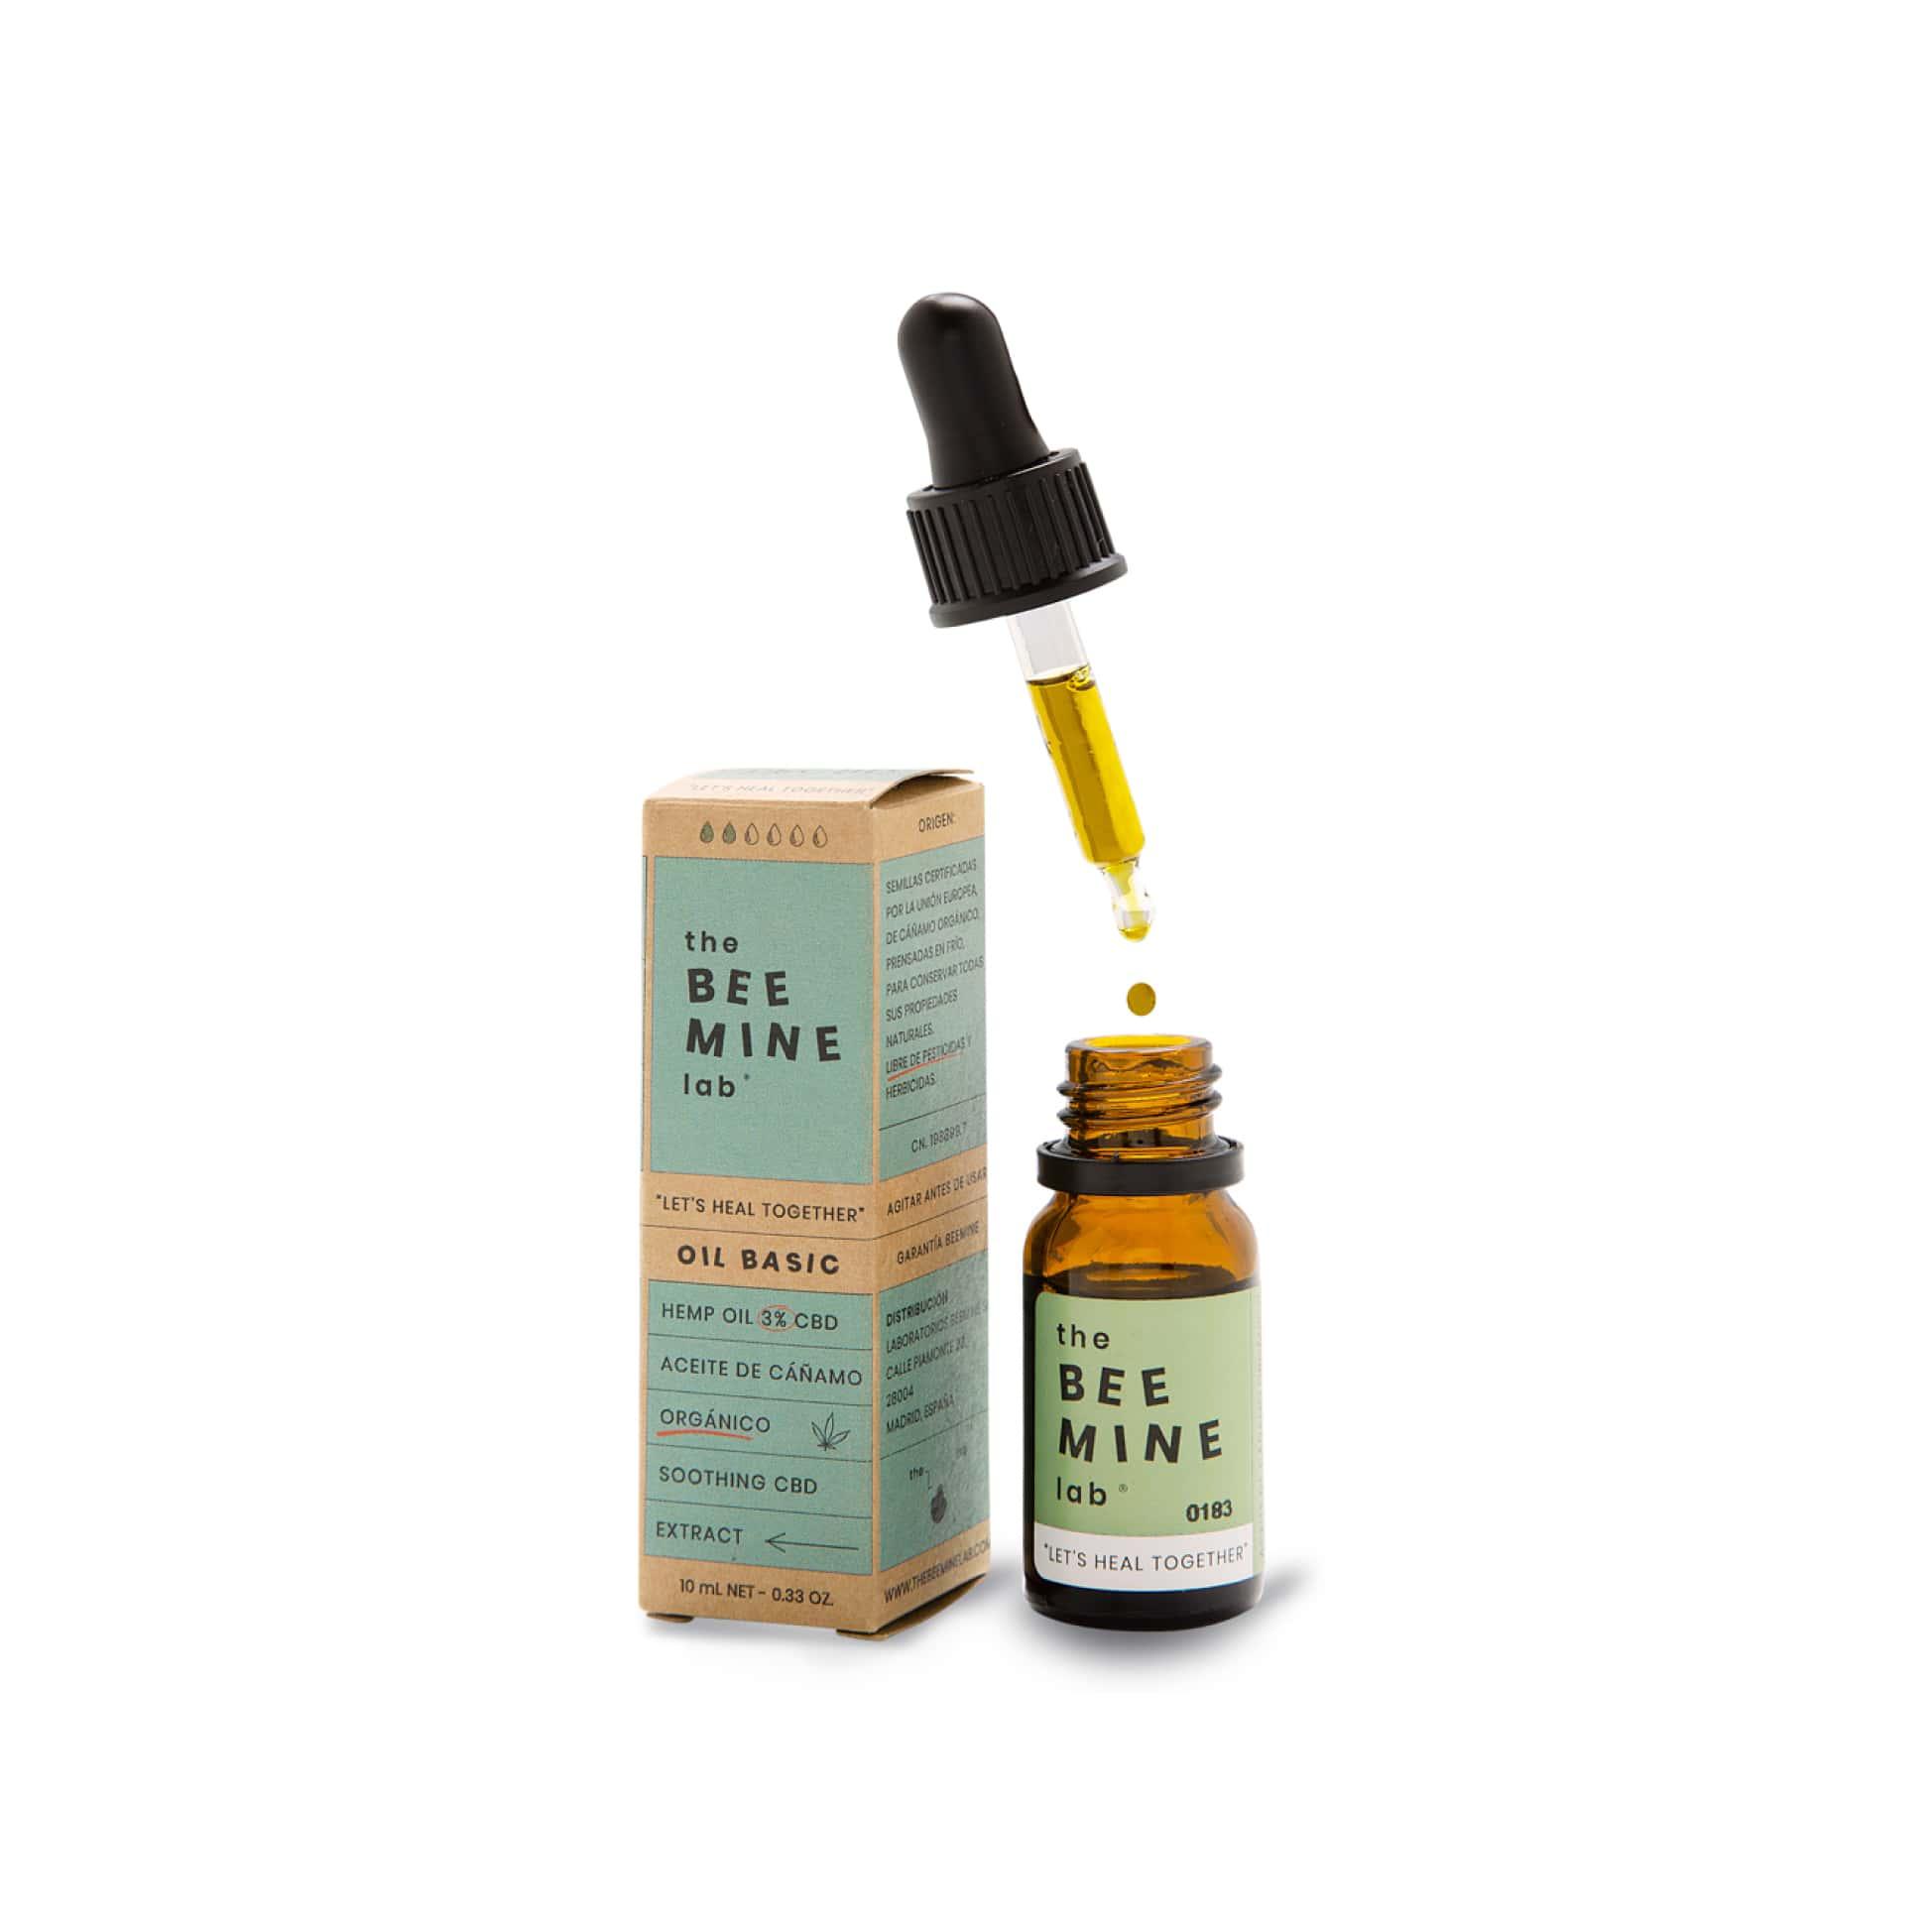 aceite basic CBD 3% abierto-min